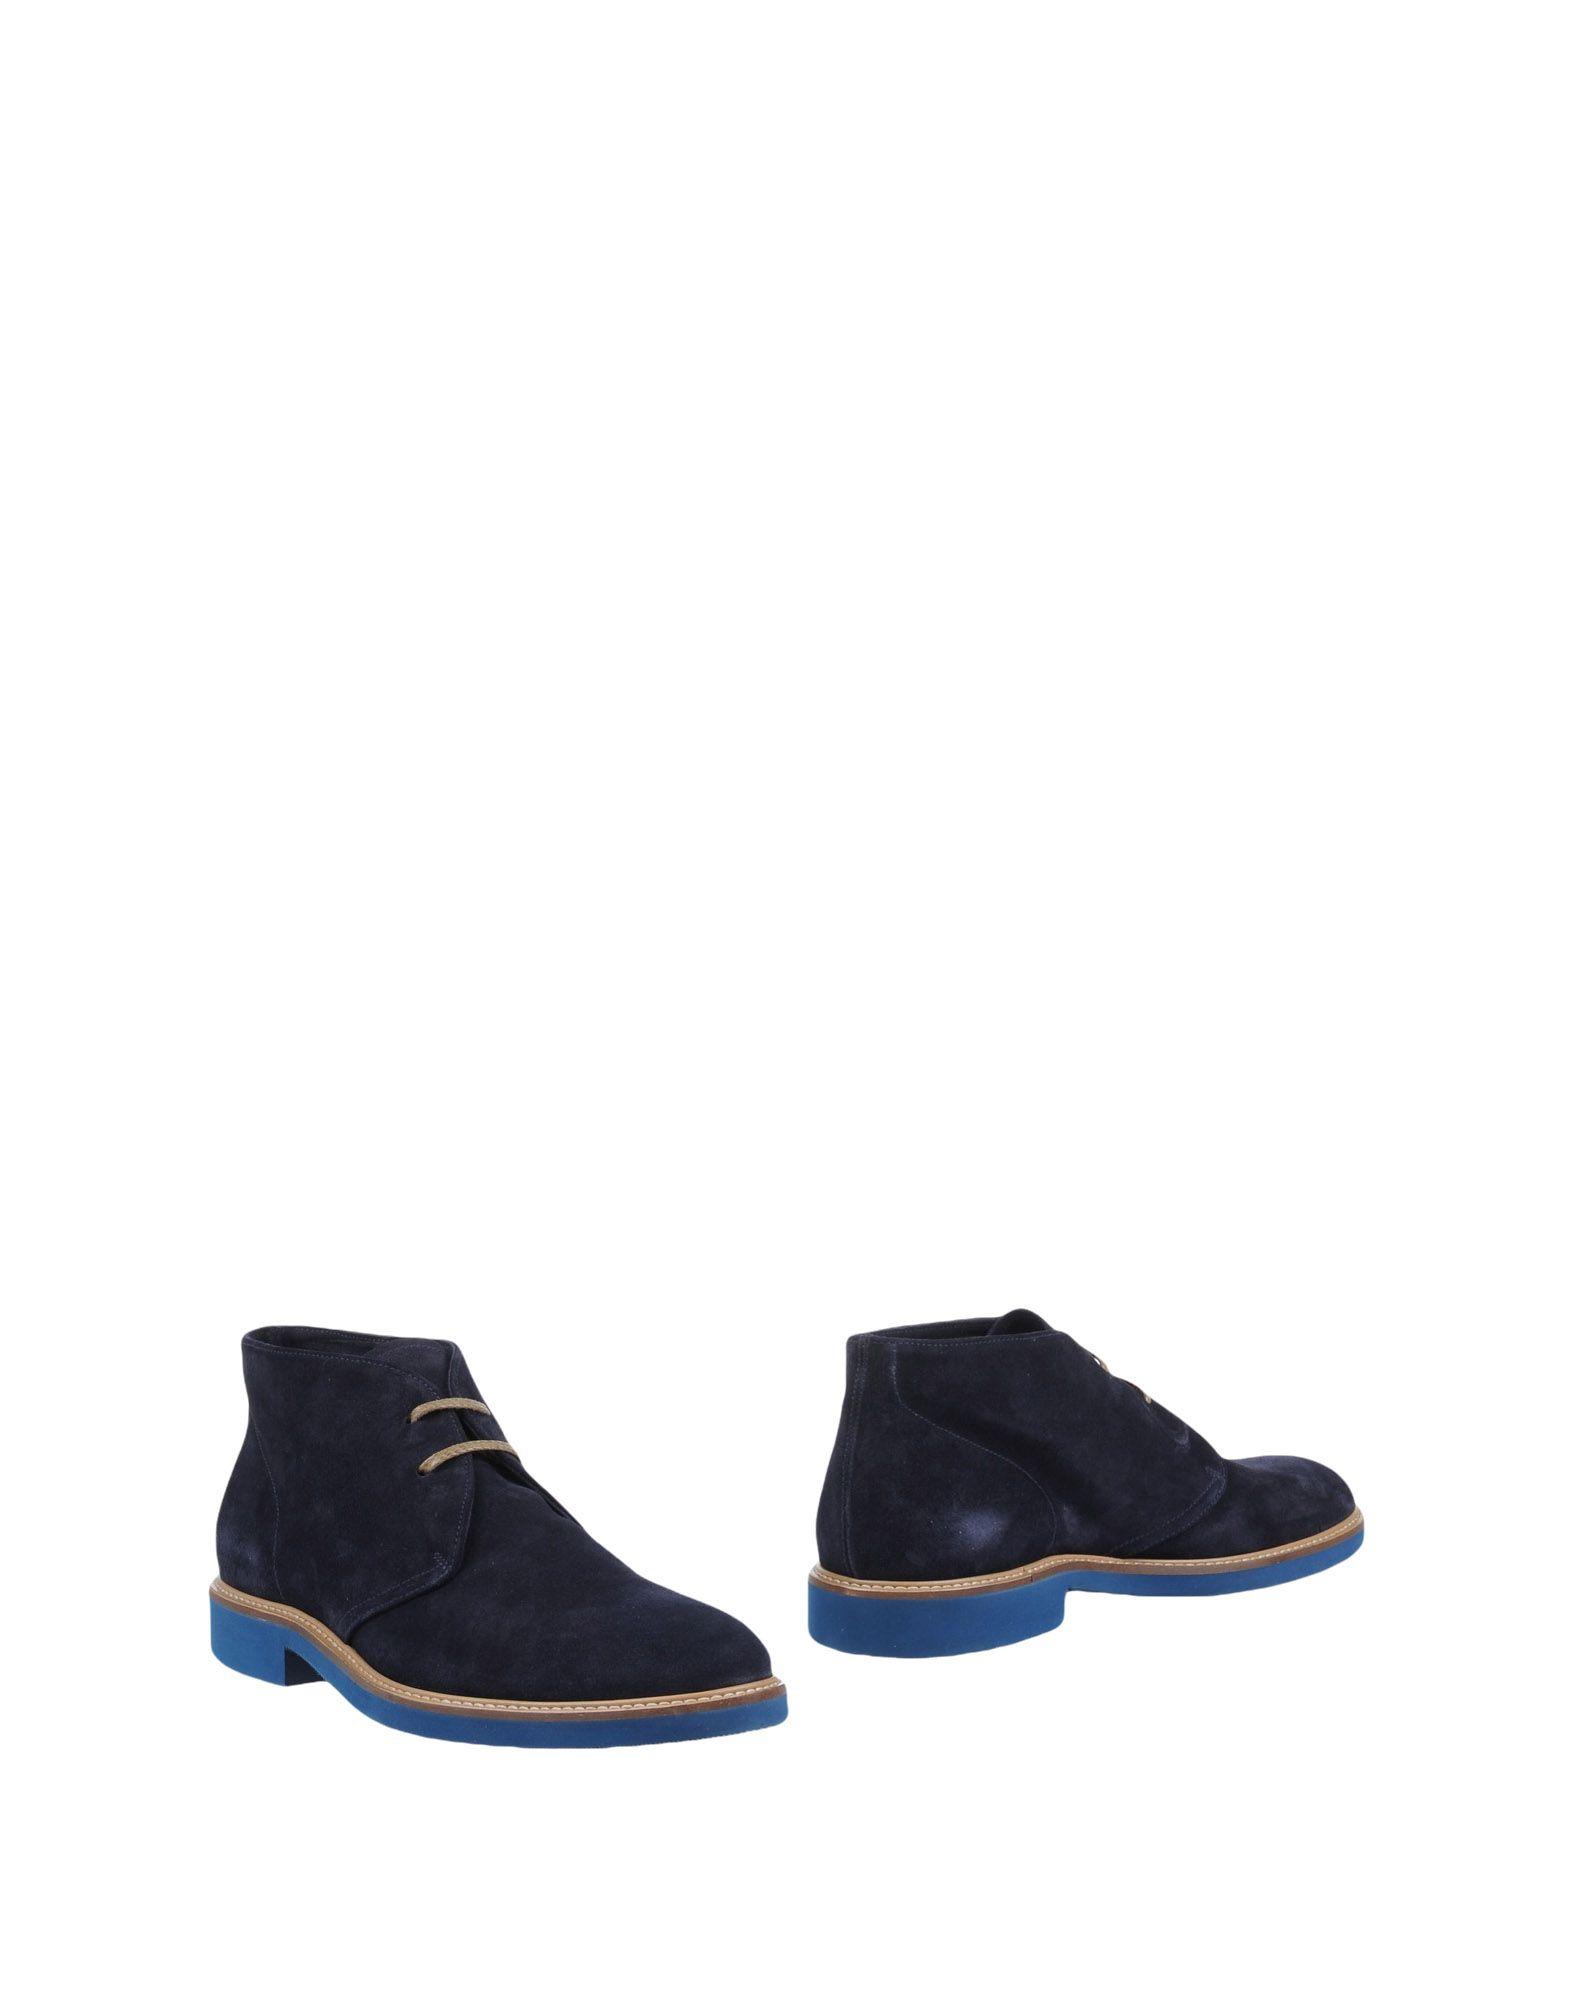 Rabatt echte  Schuhe Doucal's Stiefelette Herren  echte 11441985BO 5ff758